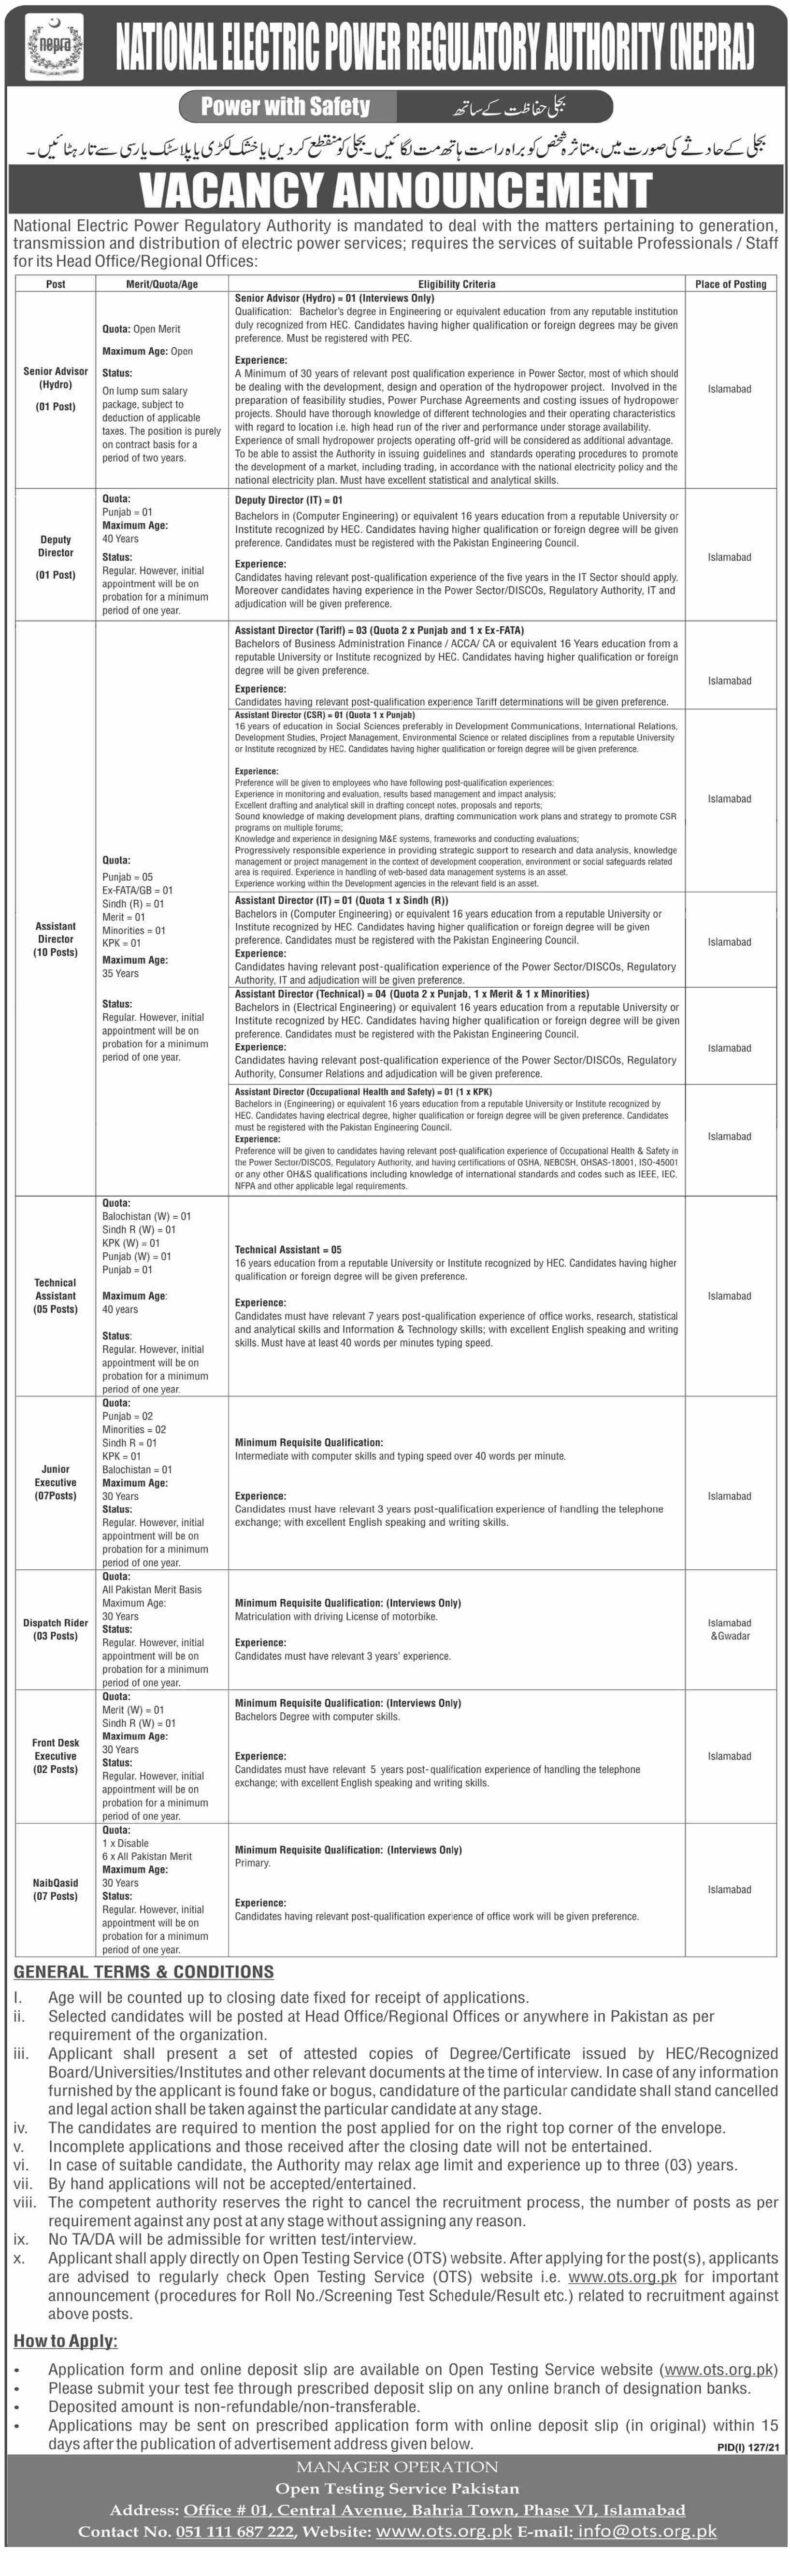 NEPRA Jobs 2021 National Electric Power Regulatory Authority